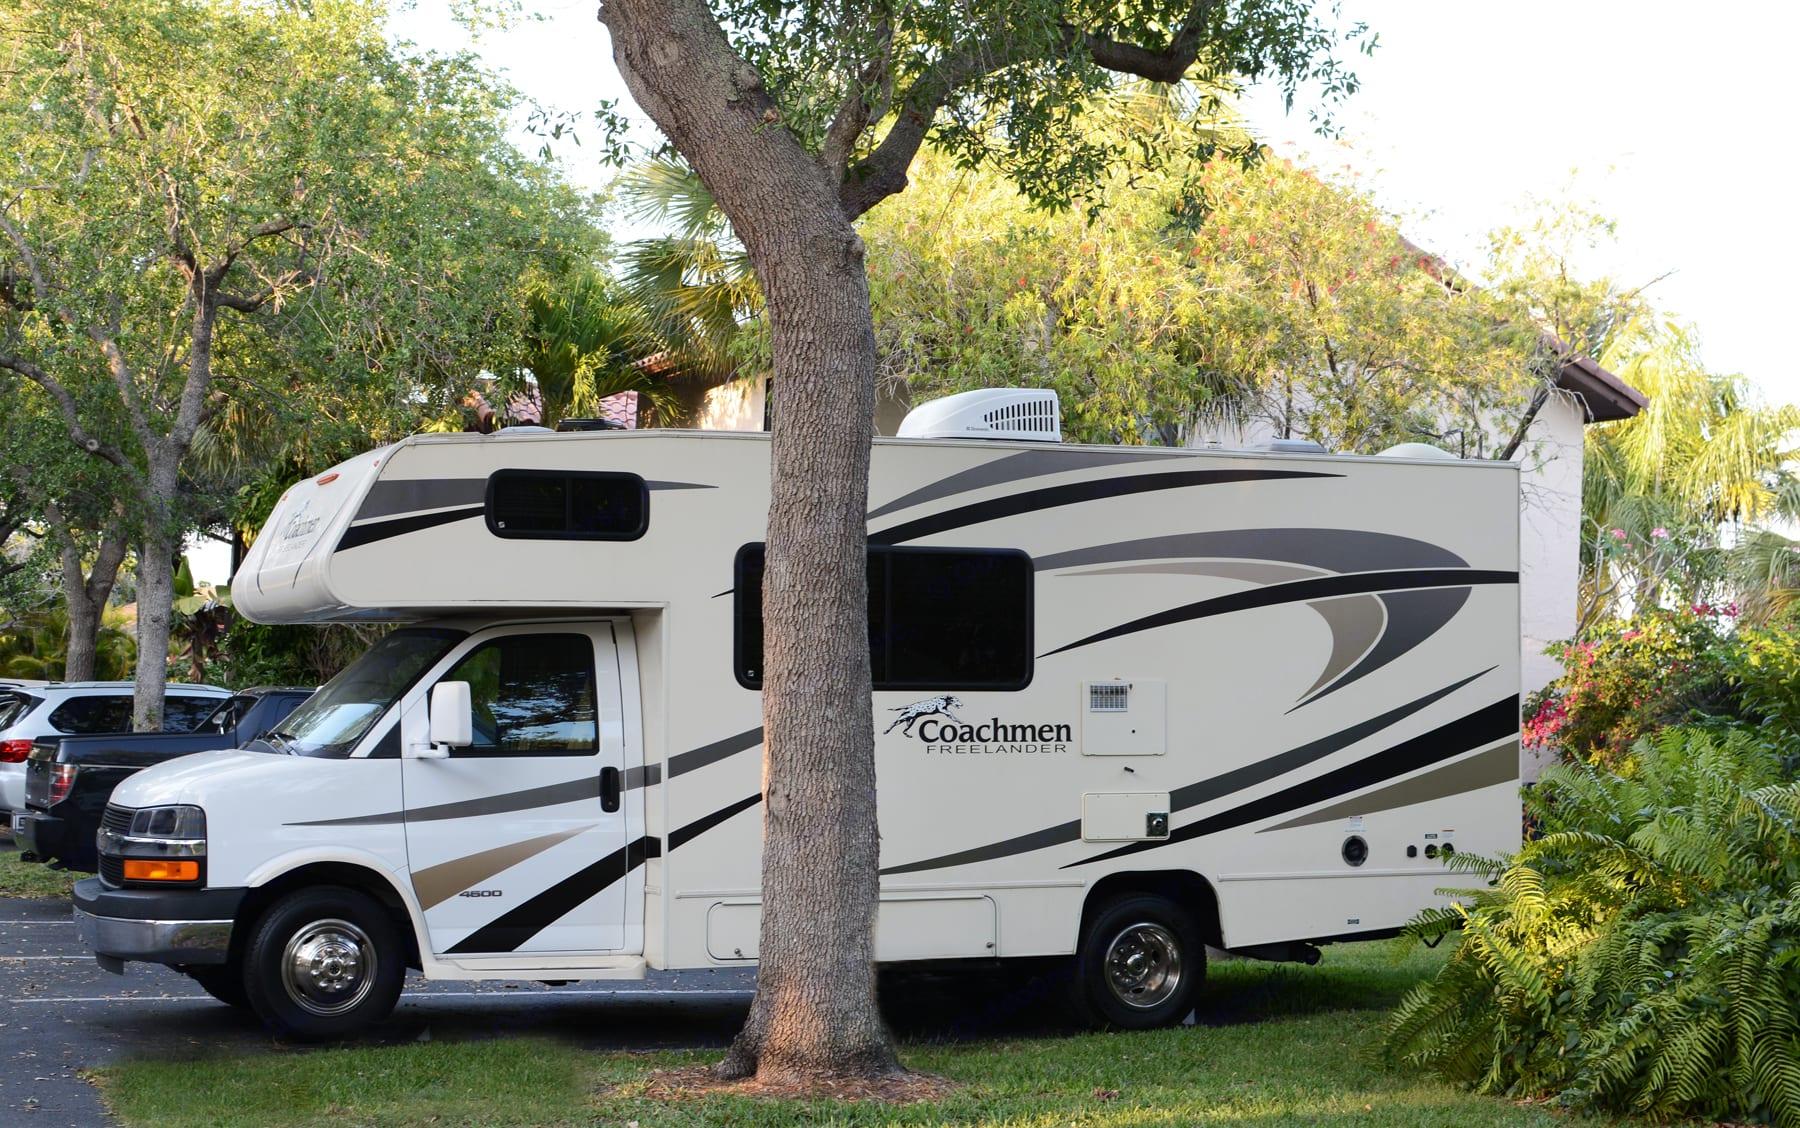 COACHMAN FREELANDER parks in a regular parking space. Coachmen Freelander 2017